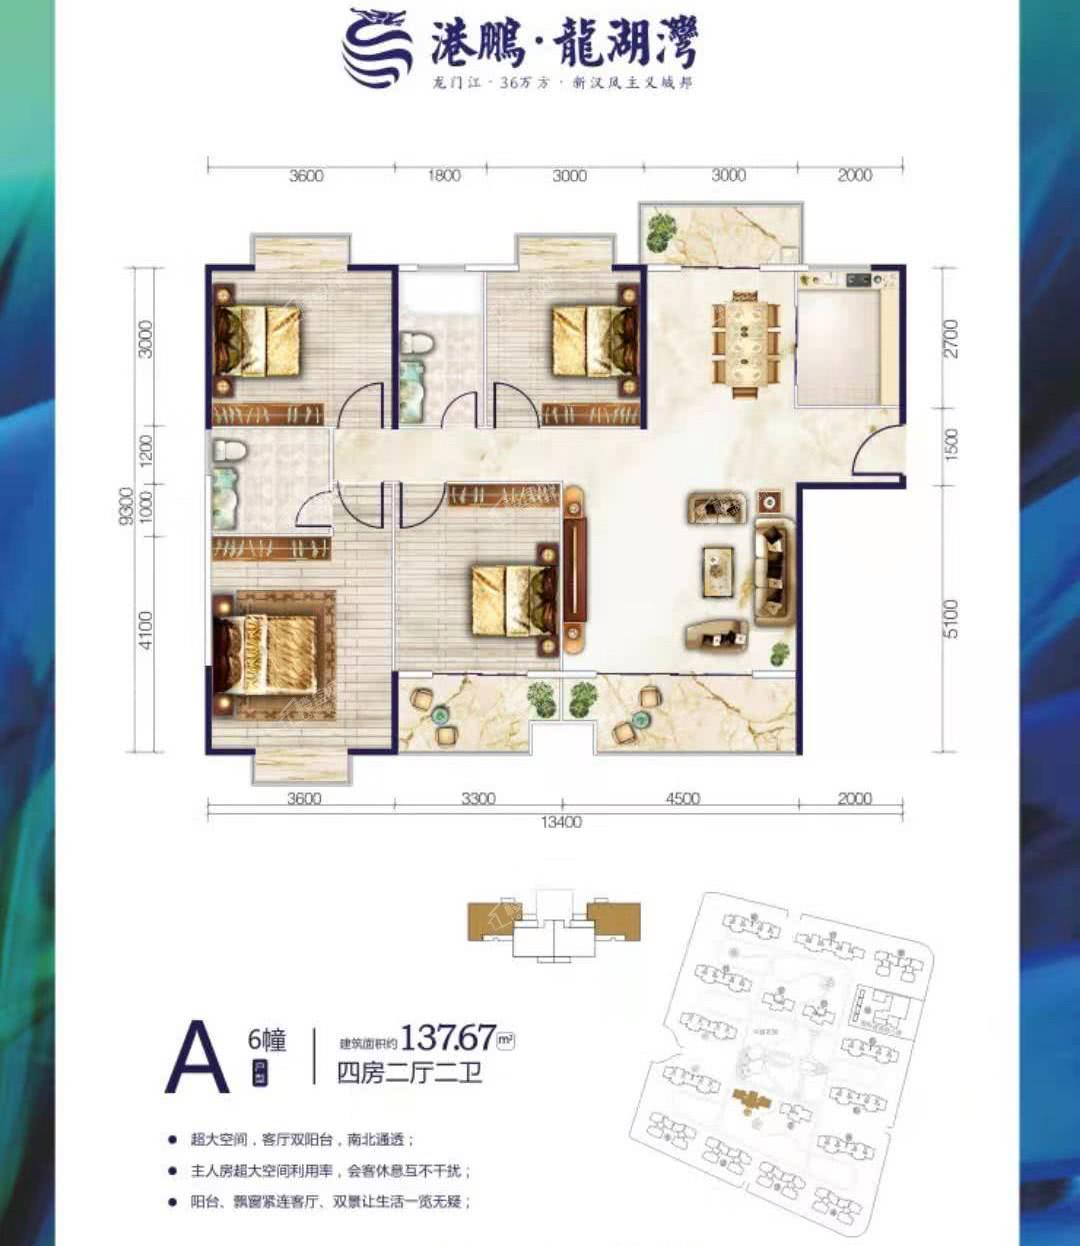 A6幢建面约137.67㎡四房两厅